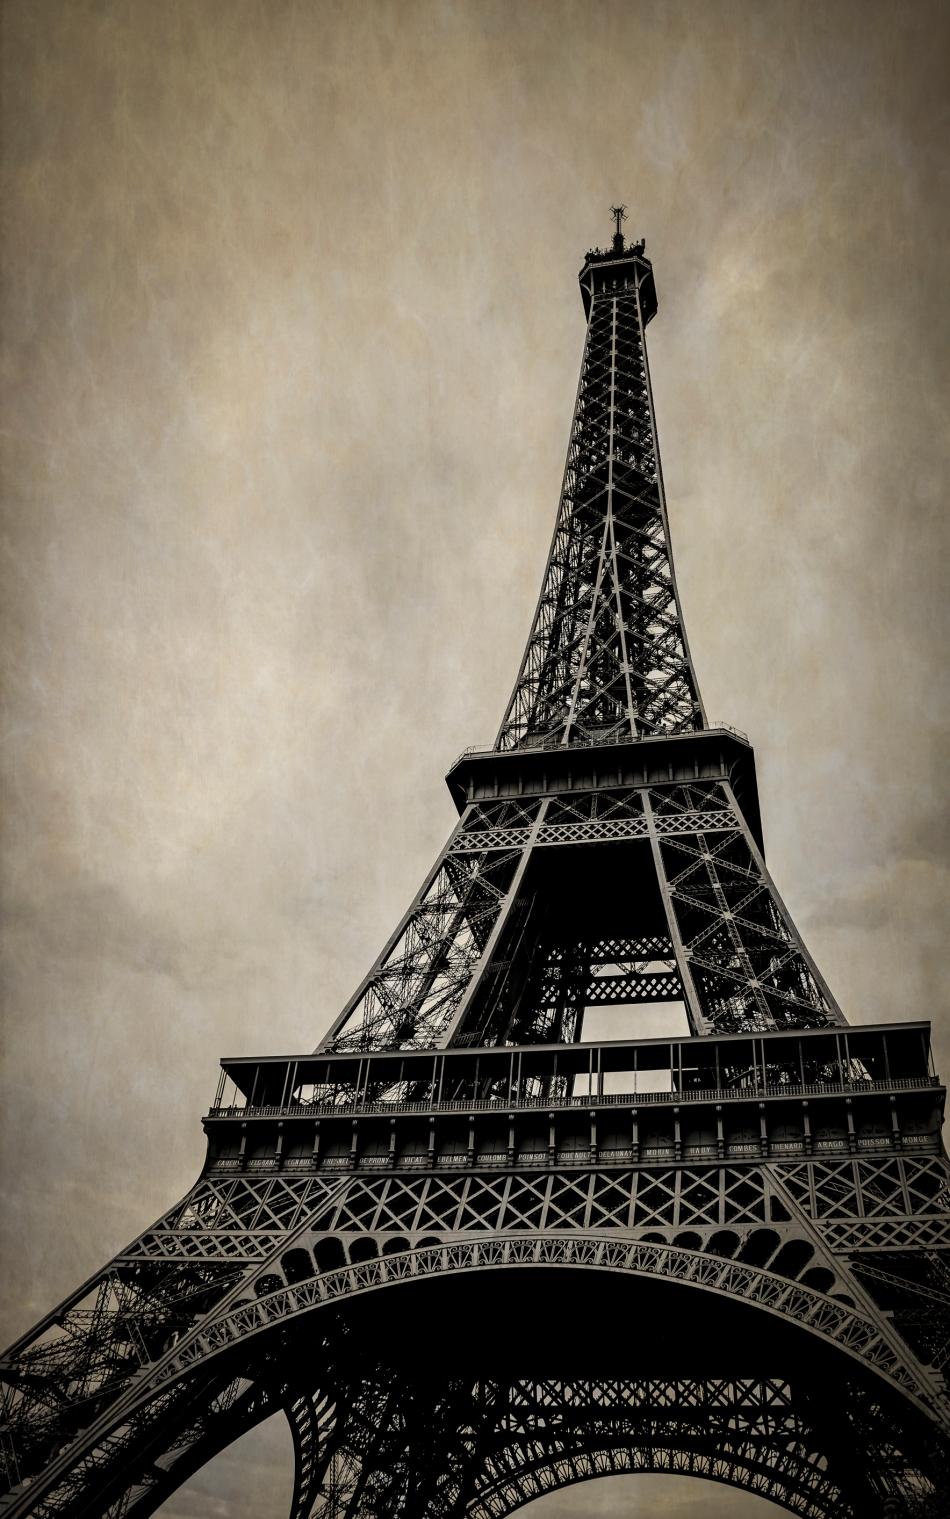 France-488-Edit-2